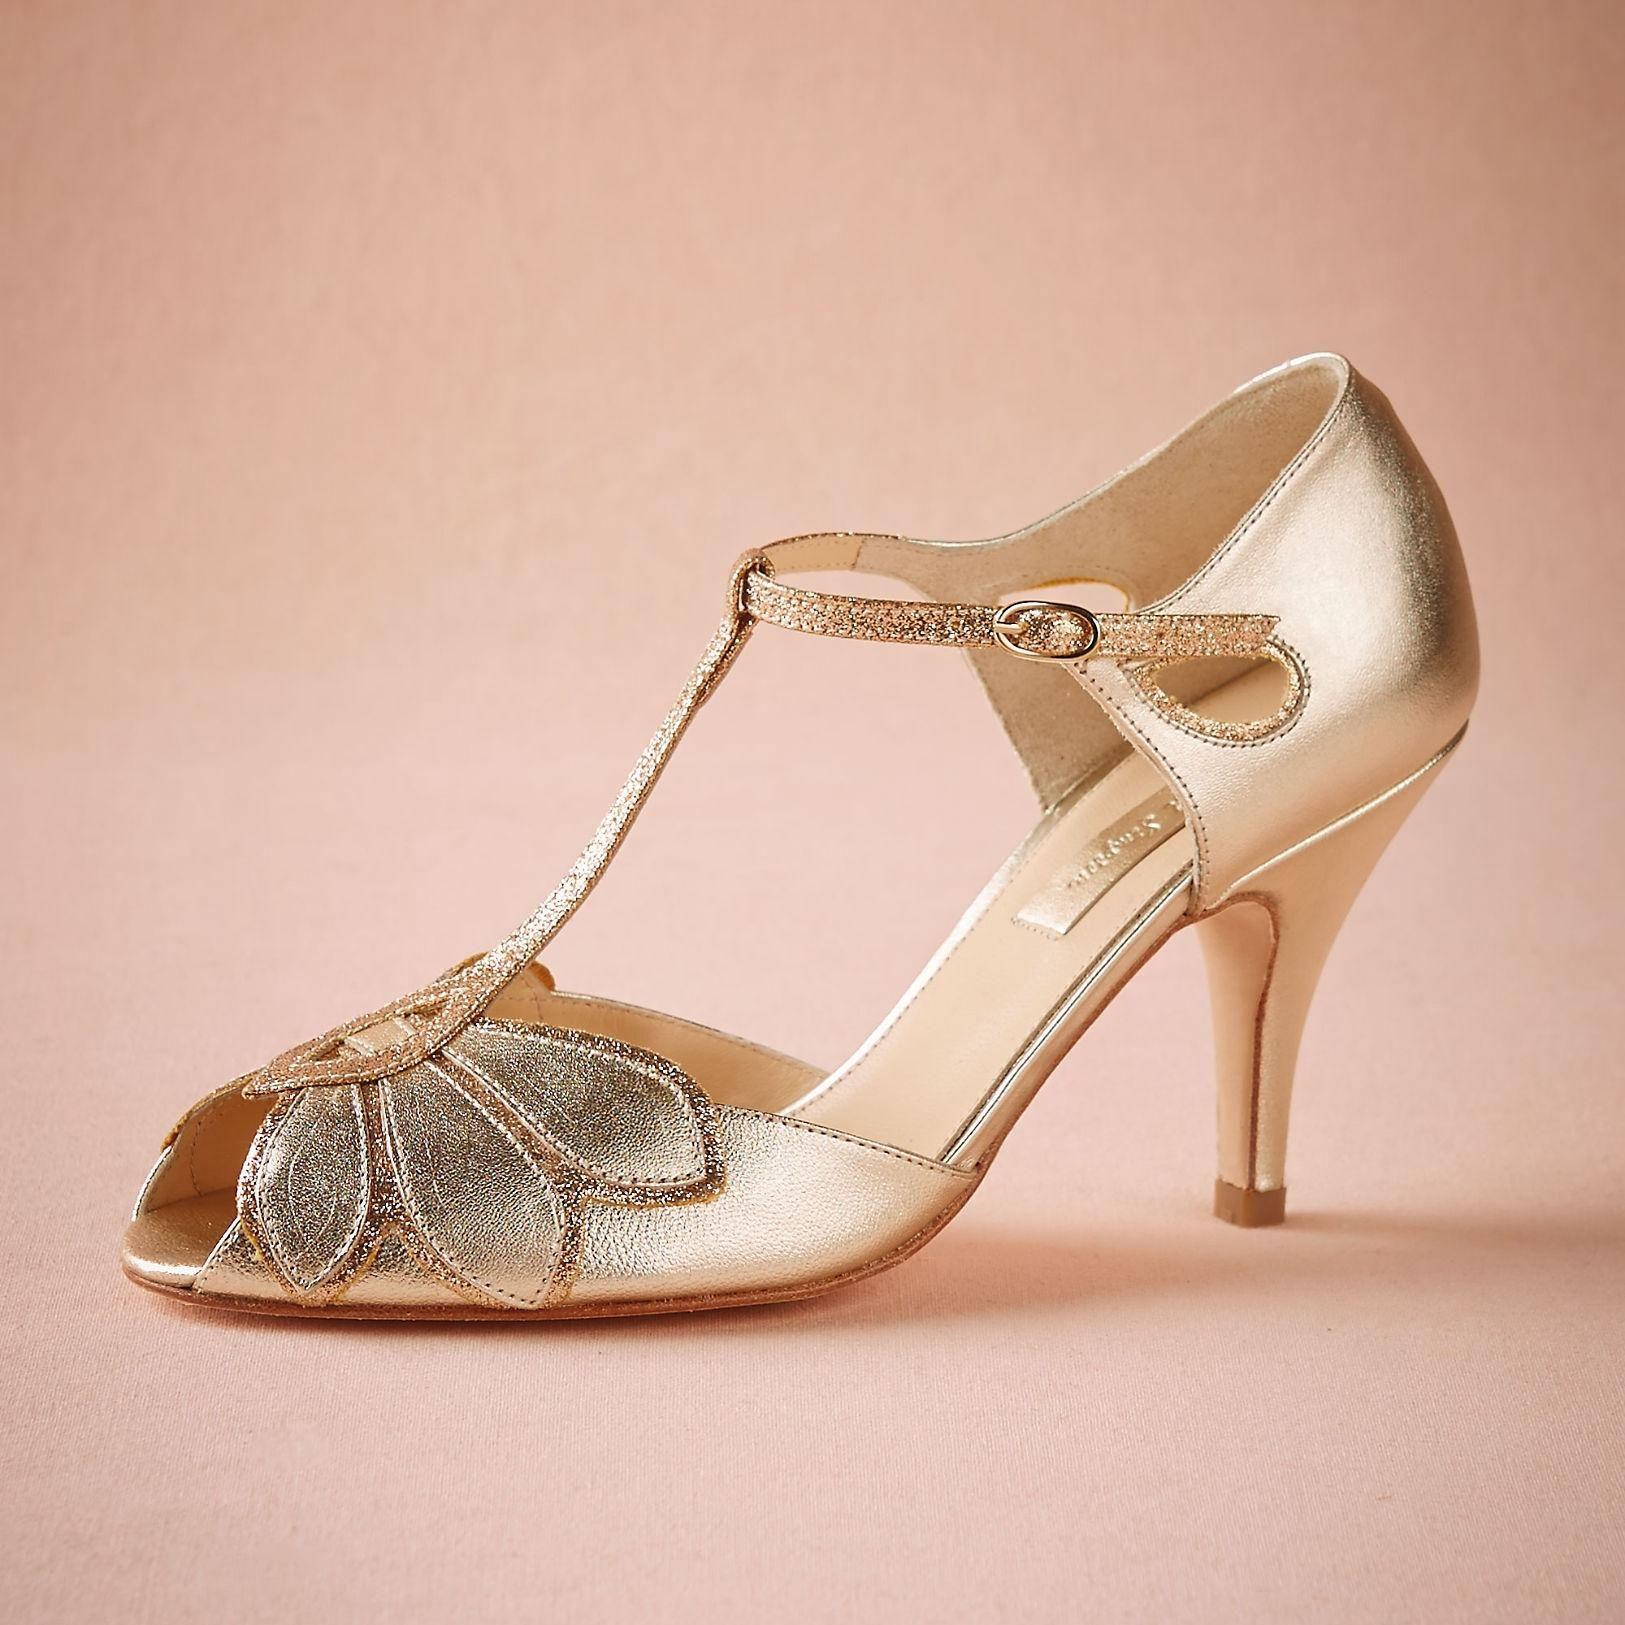 Vintage Gold Wedding Shoes Women Pumps Kitten Heel T Straps Buckle Closure Leather Party Dance 3 High Heels Women Sandals Cus Sapatos Acessorios Danca De Salao